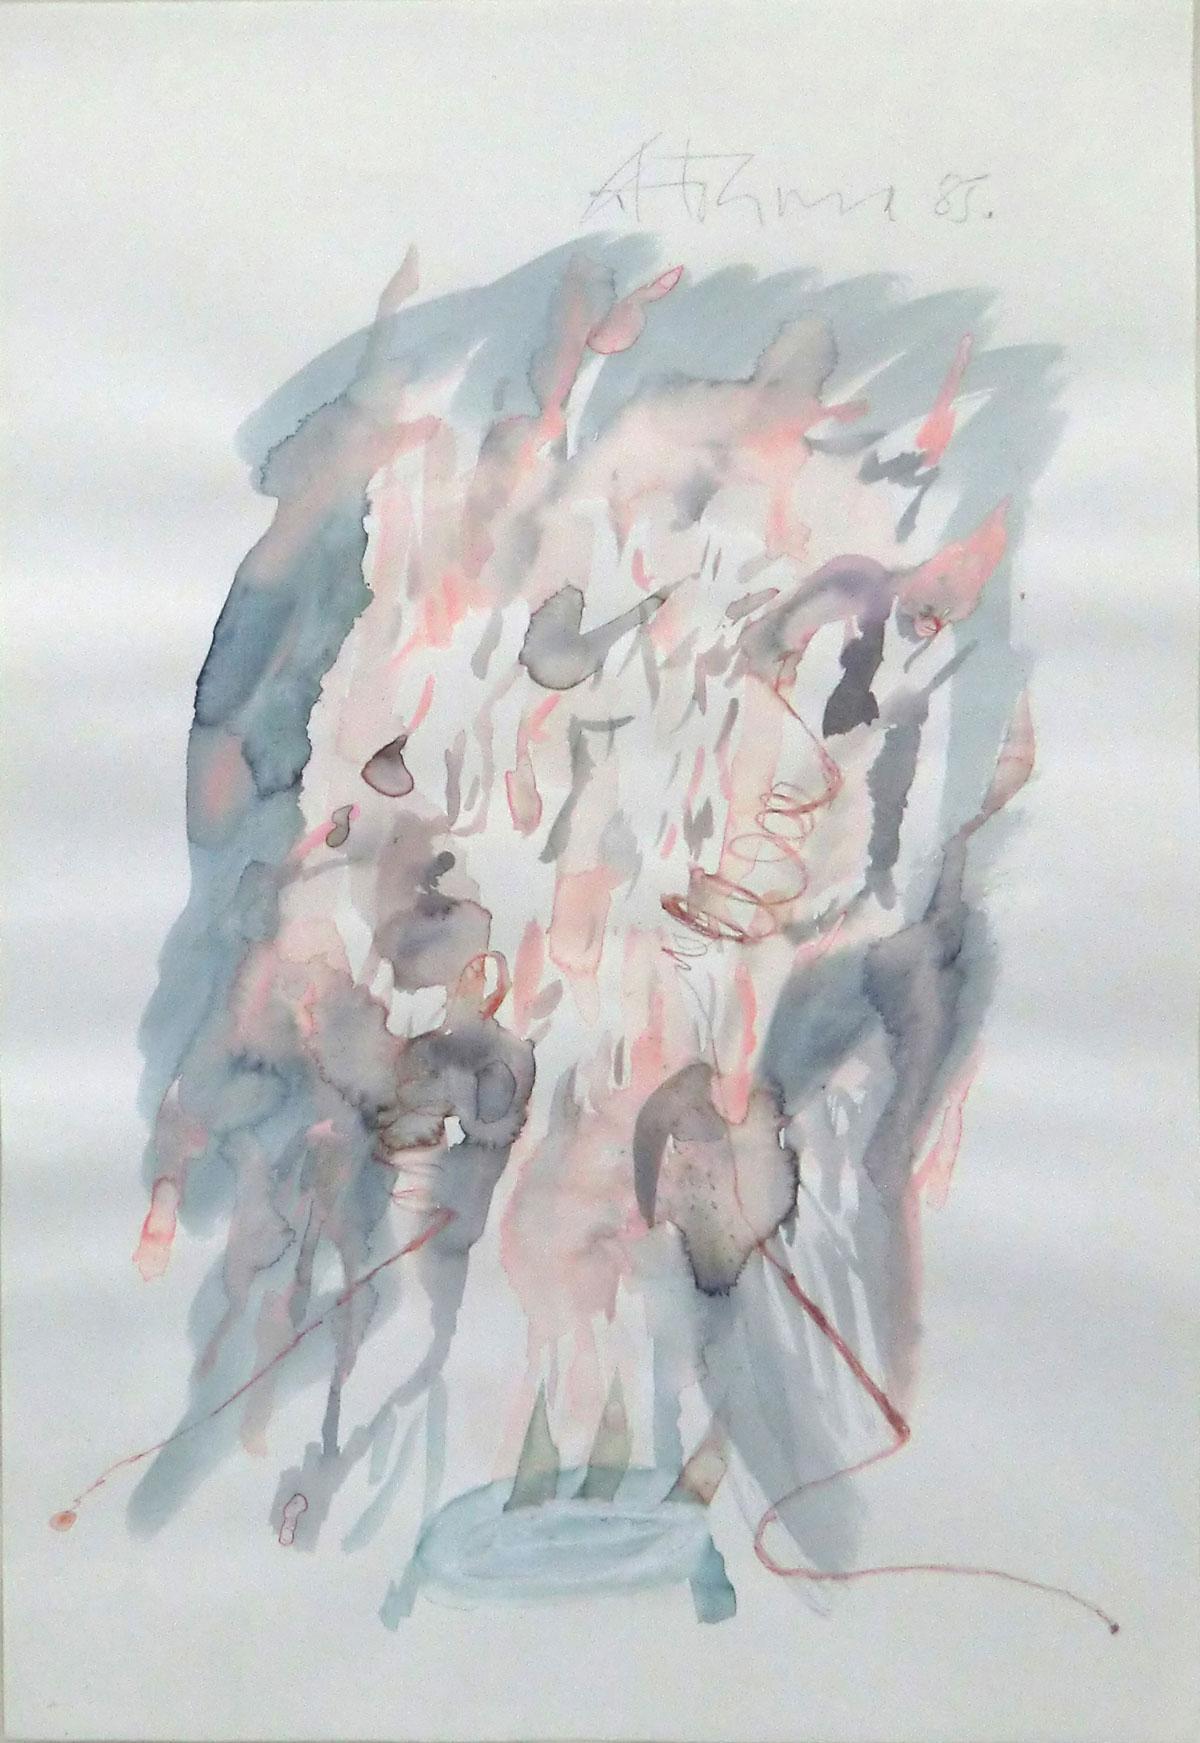 Gerhard Hoehme Malerei, Ohne Titel, 1985